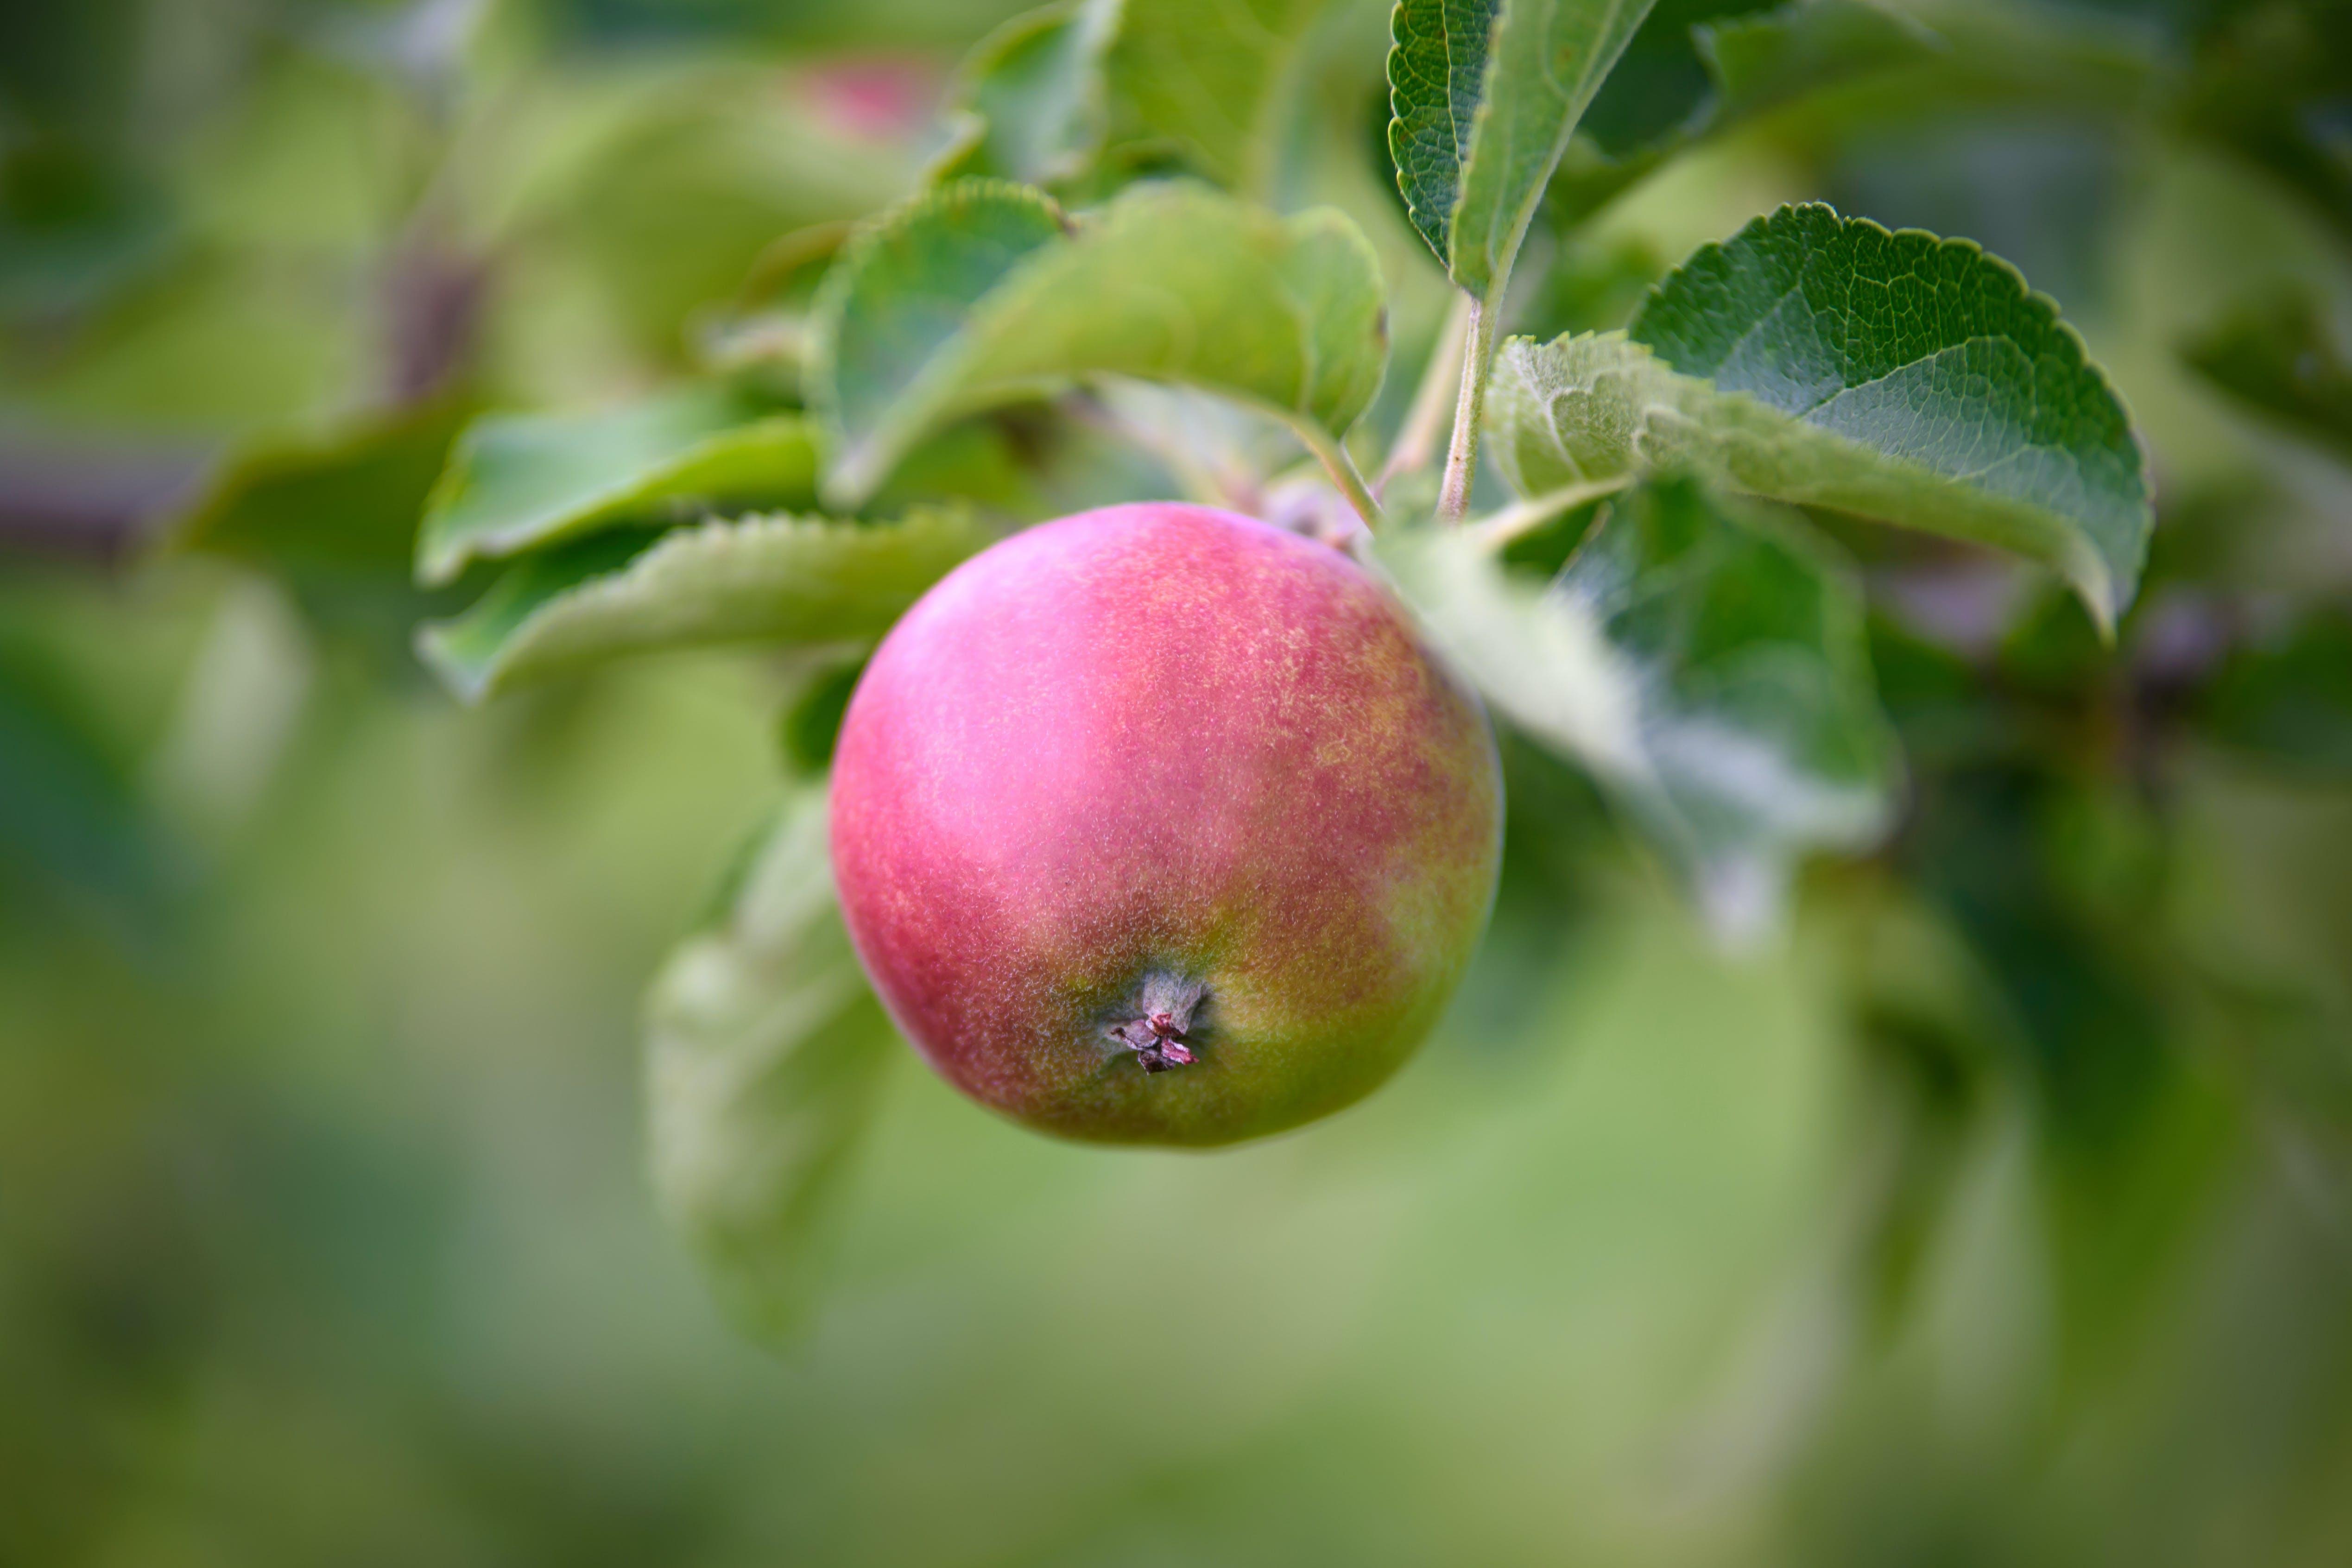 apple, blur, bright